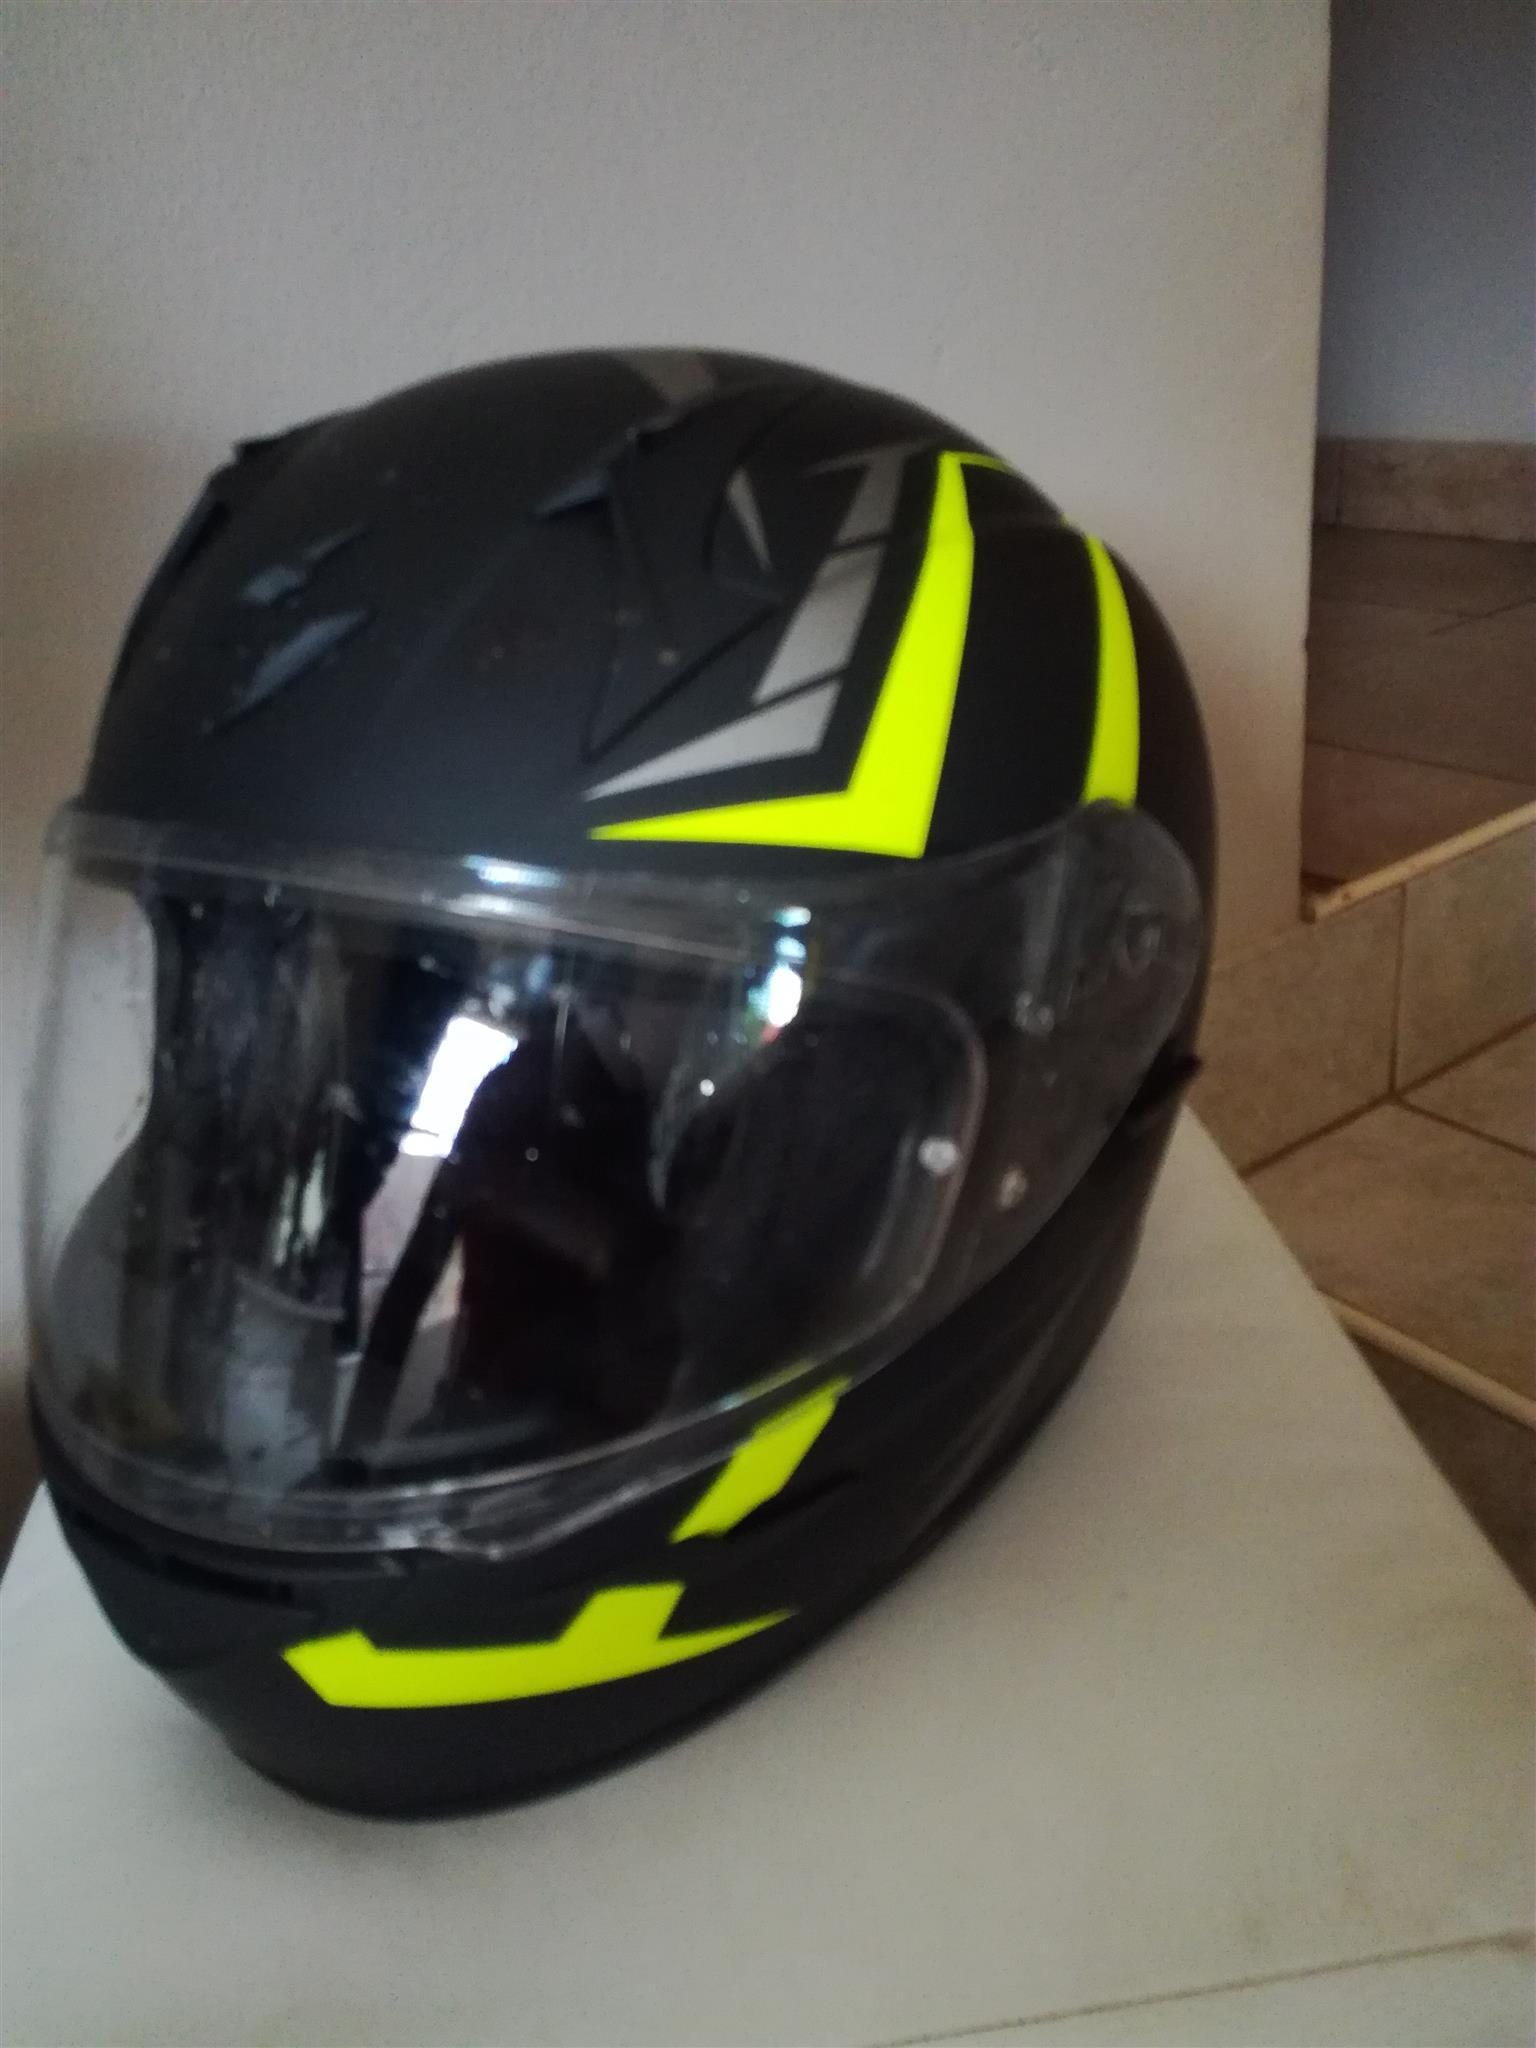 2009 Ducati 1098s